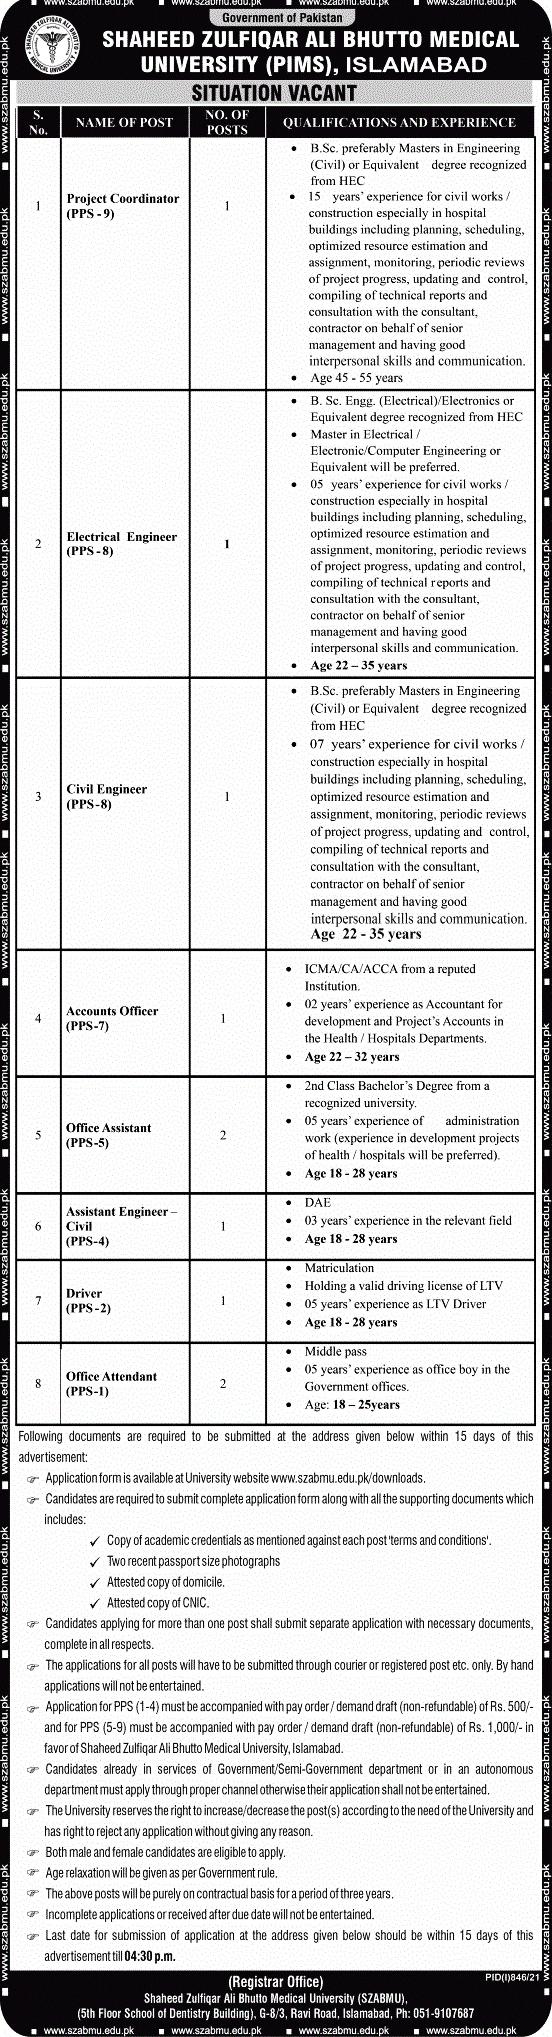 Latest Jobs in Shaheed Zulfiqar Ali Bhutto Medical University SZABMU 2021